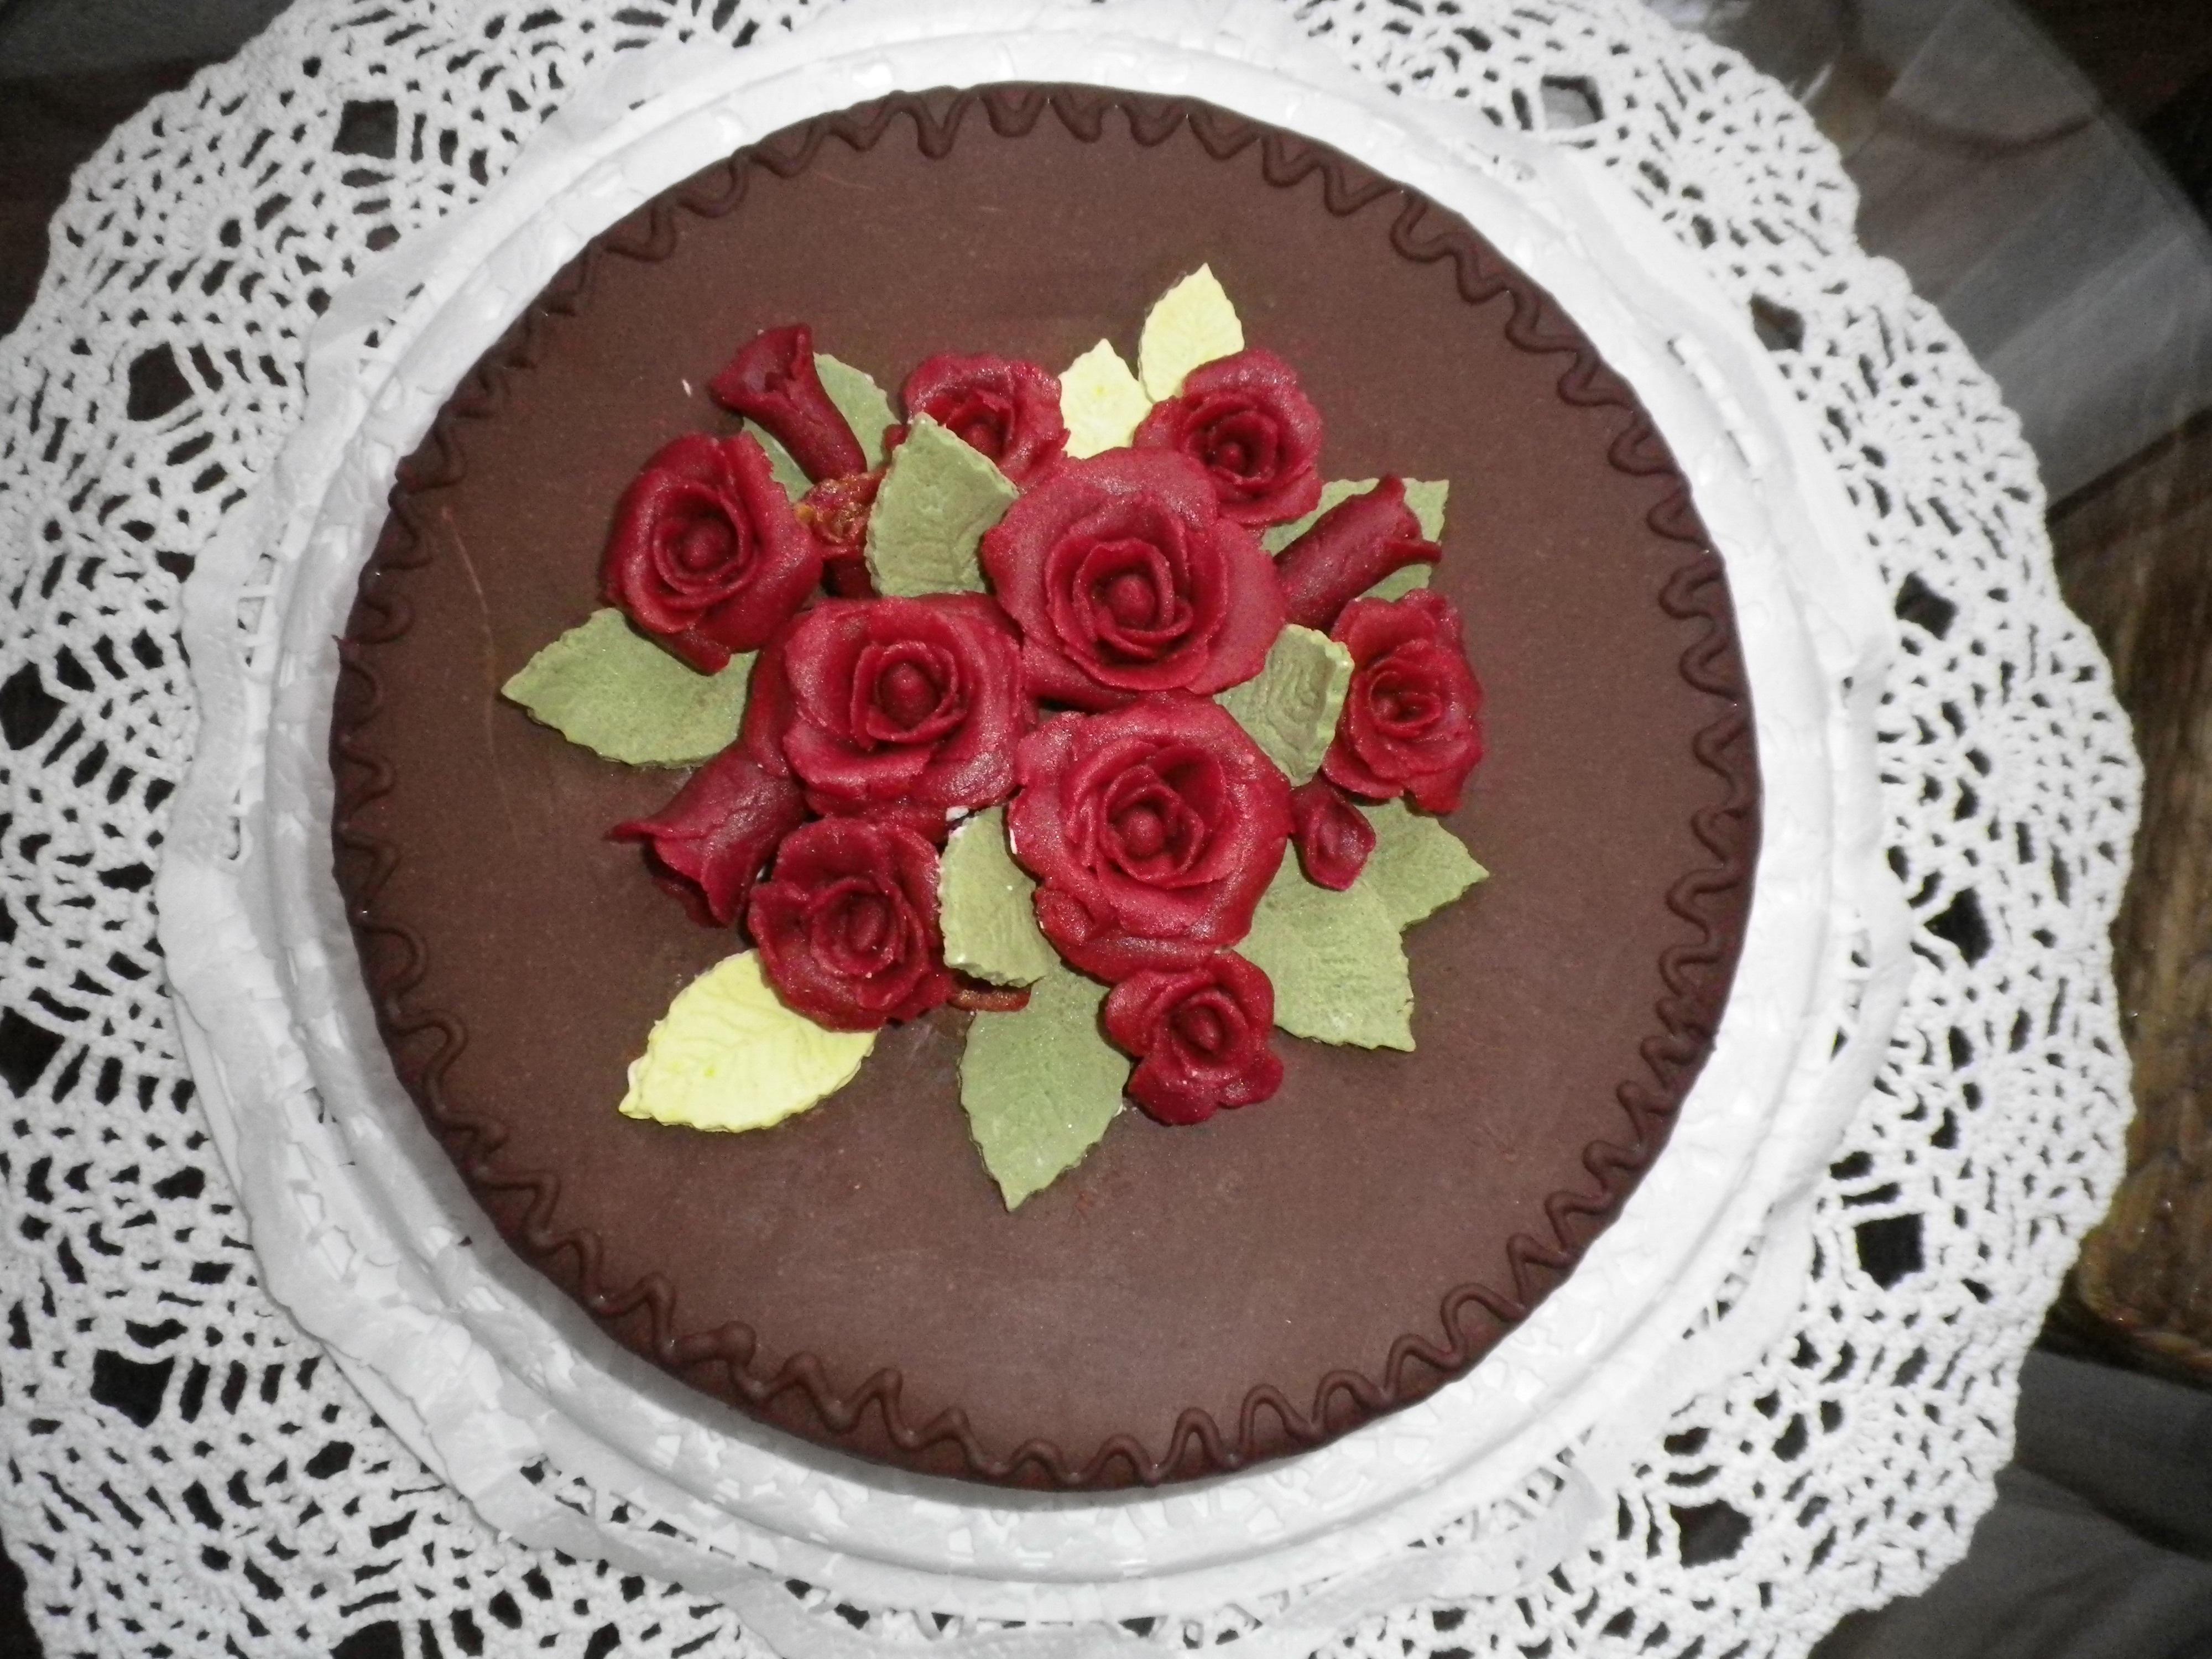 Free Images : flower, food, dessert, ornament, birthday cake